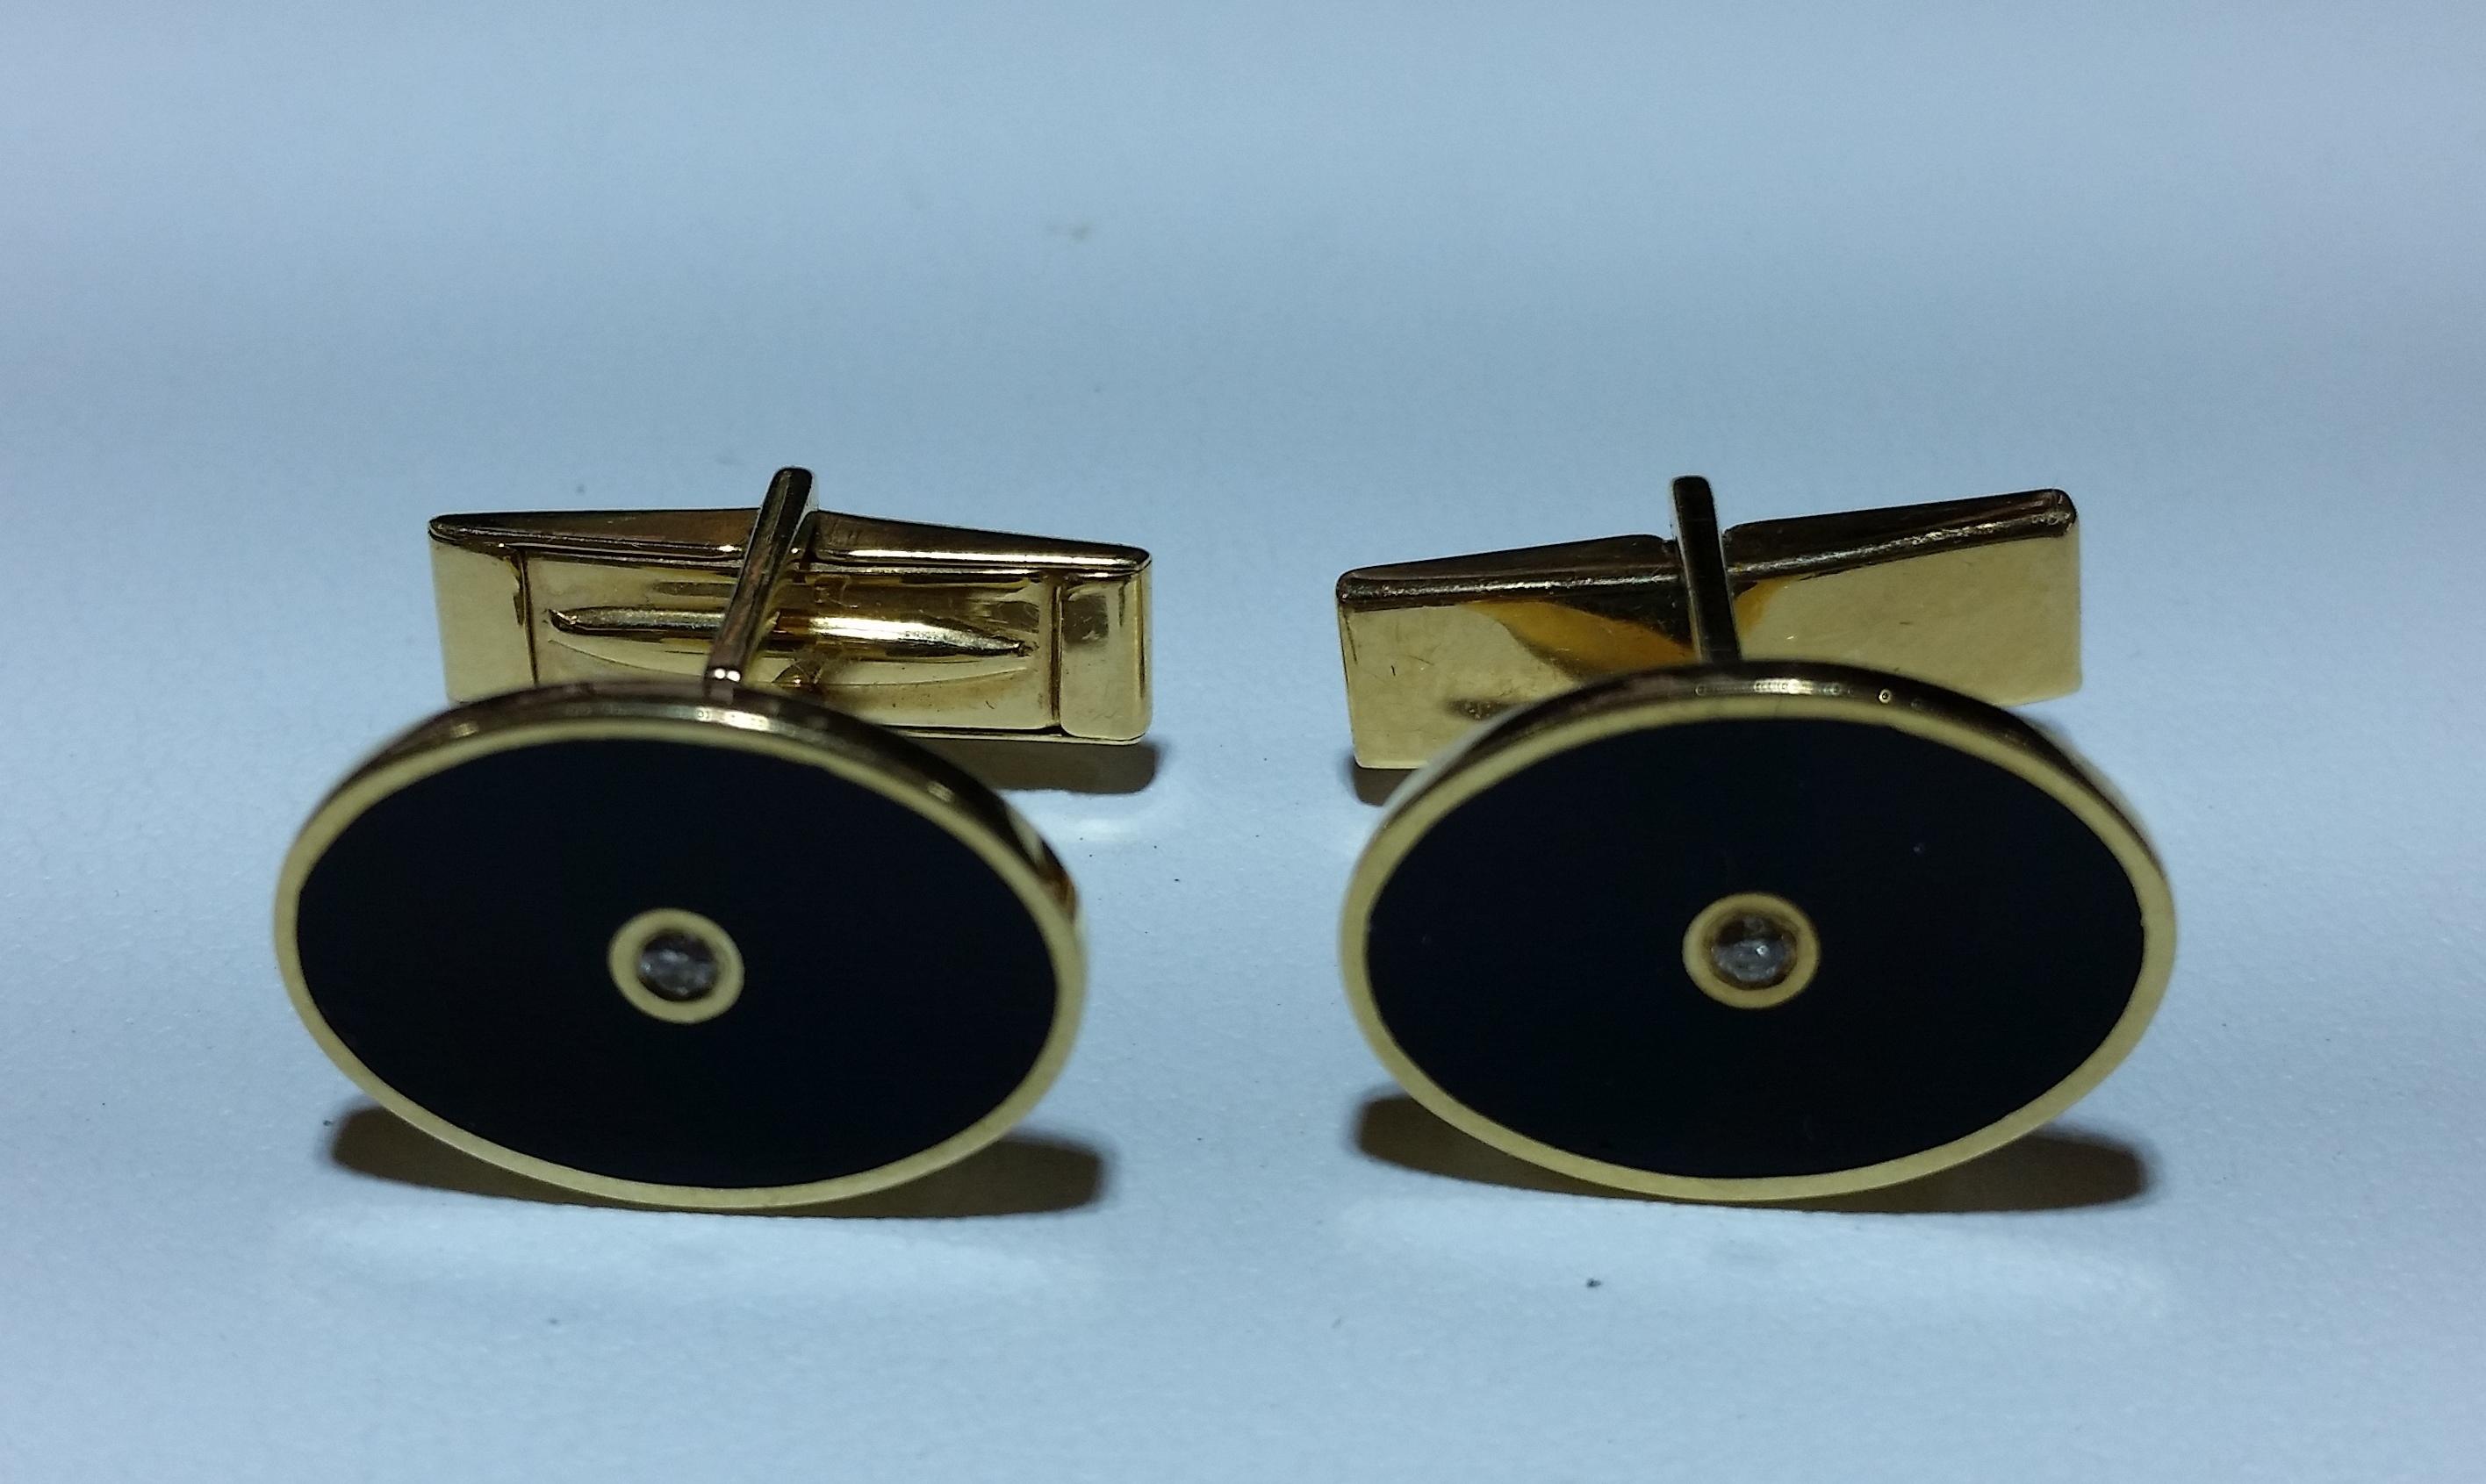 14k Yellow Gold Oval Cufflinks with Bezel Set Black Onyx and .01 Carat Diamond